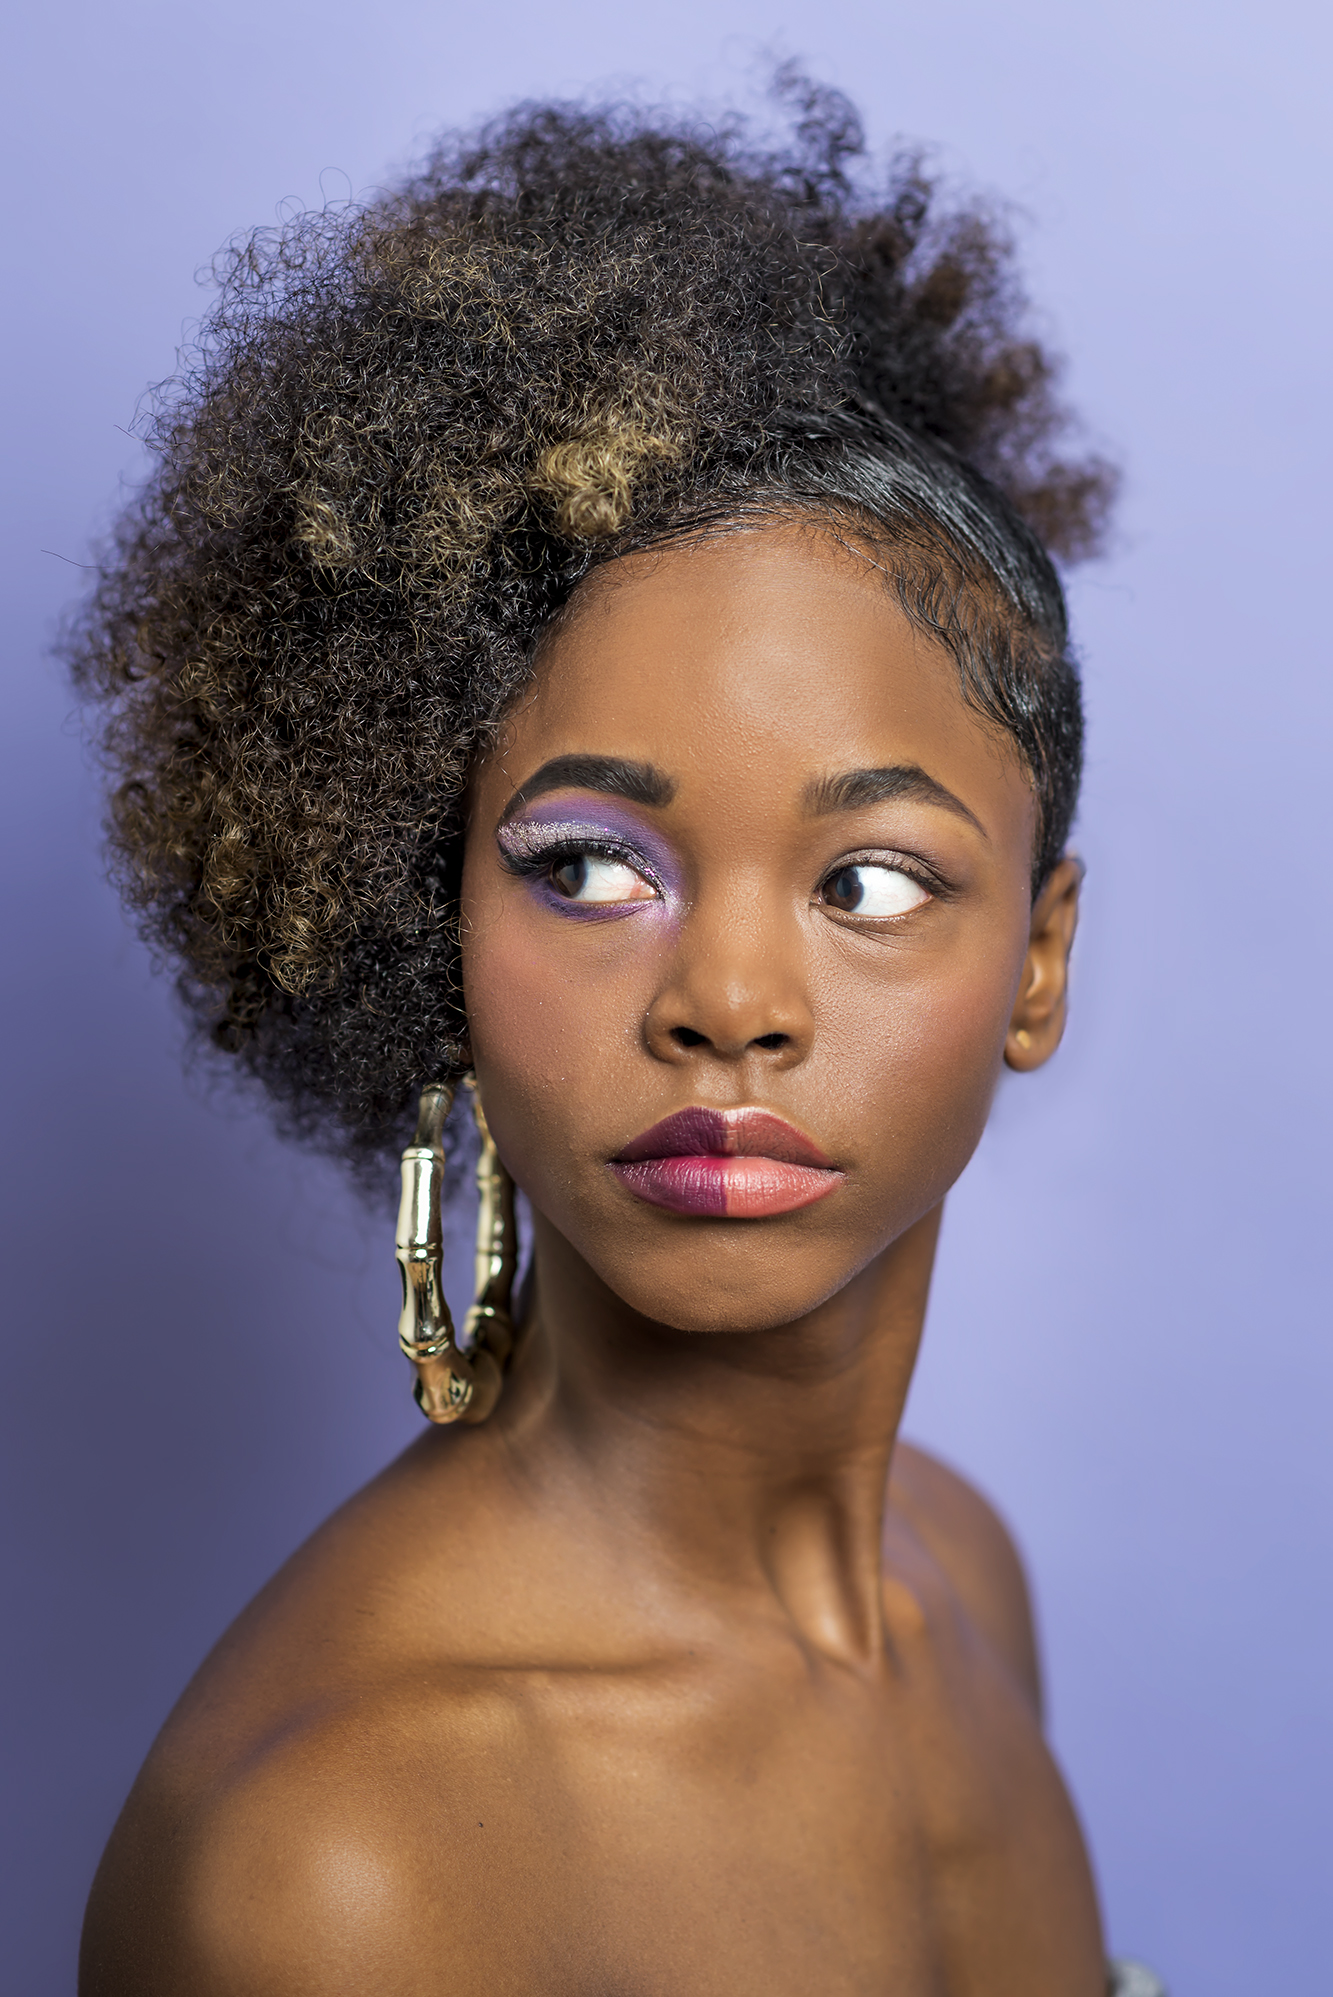 Photographer:   @ii_pix_photography_   Makeup Artist:  @nofxgivenmua   Model:  @jamellacross   Text:  @im_kelpsea